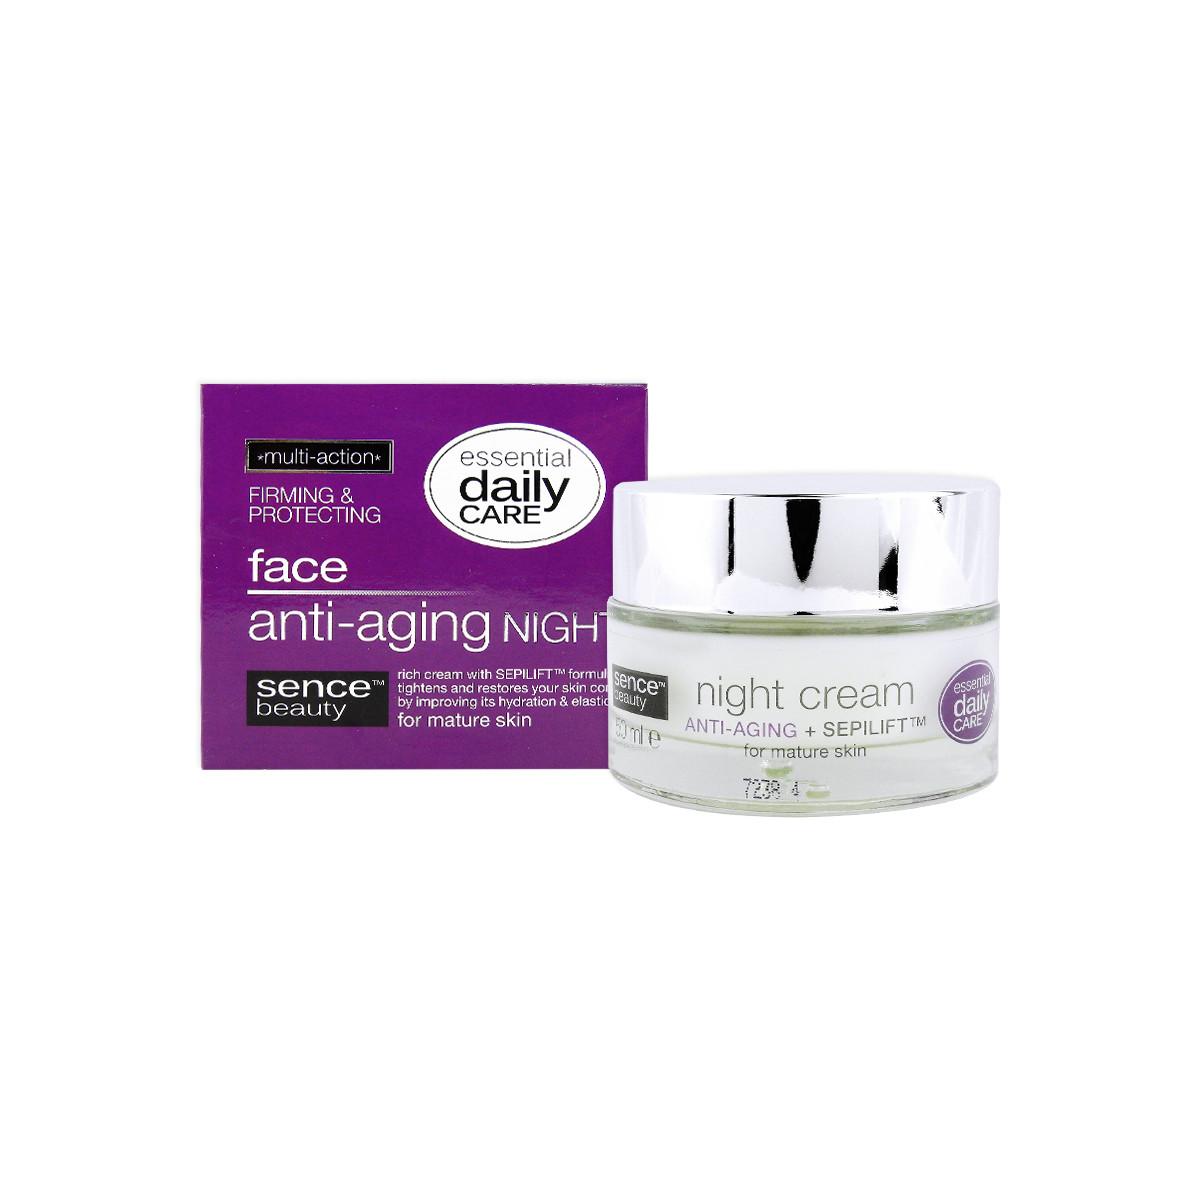 image of  歐洲Sencebeauty 撫紋修護保濕晚霜50ml   Europe Sencebeauty Night Cream Anti-Aging+Sepilift 50ml